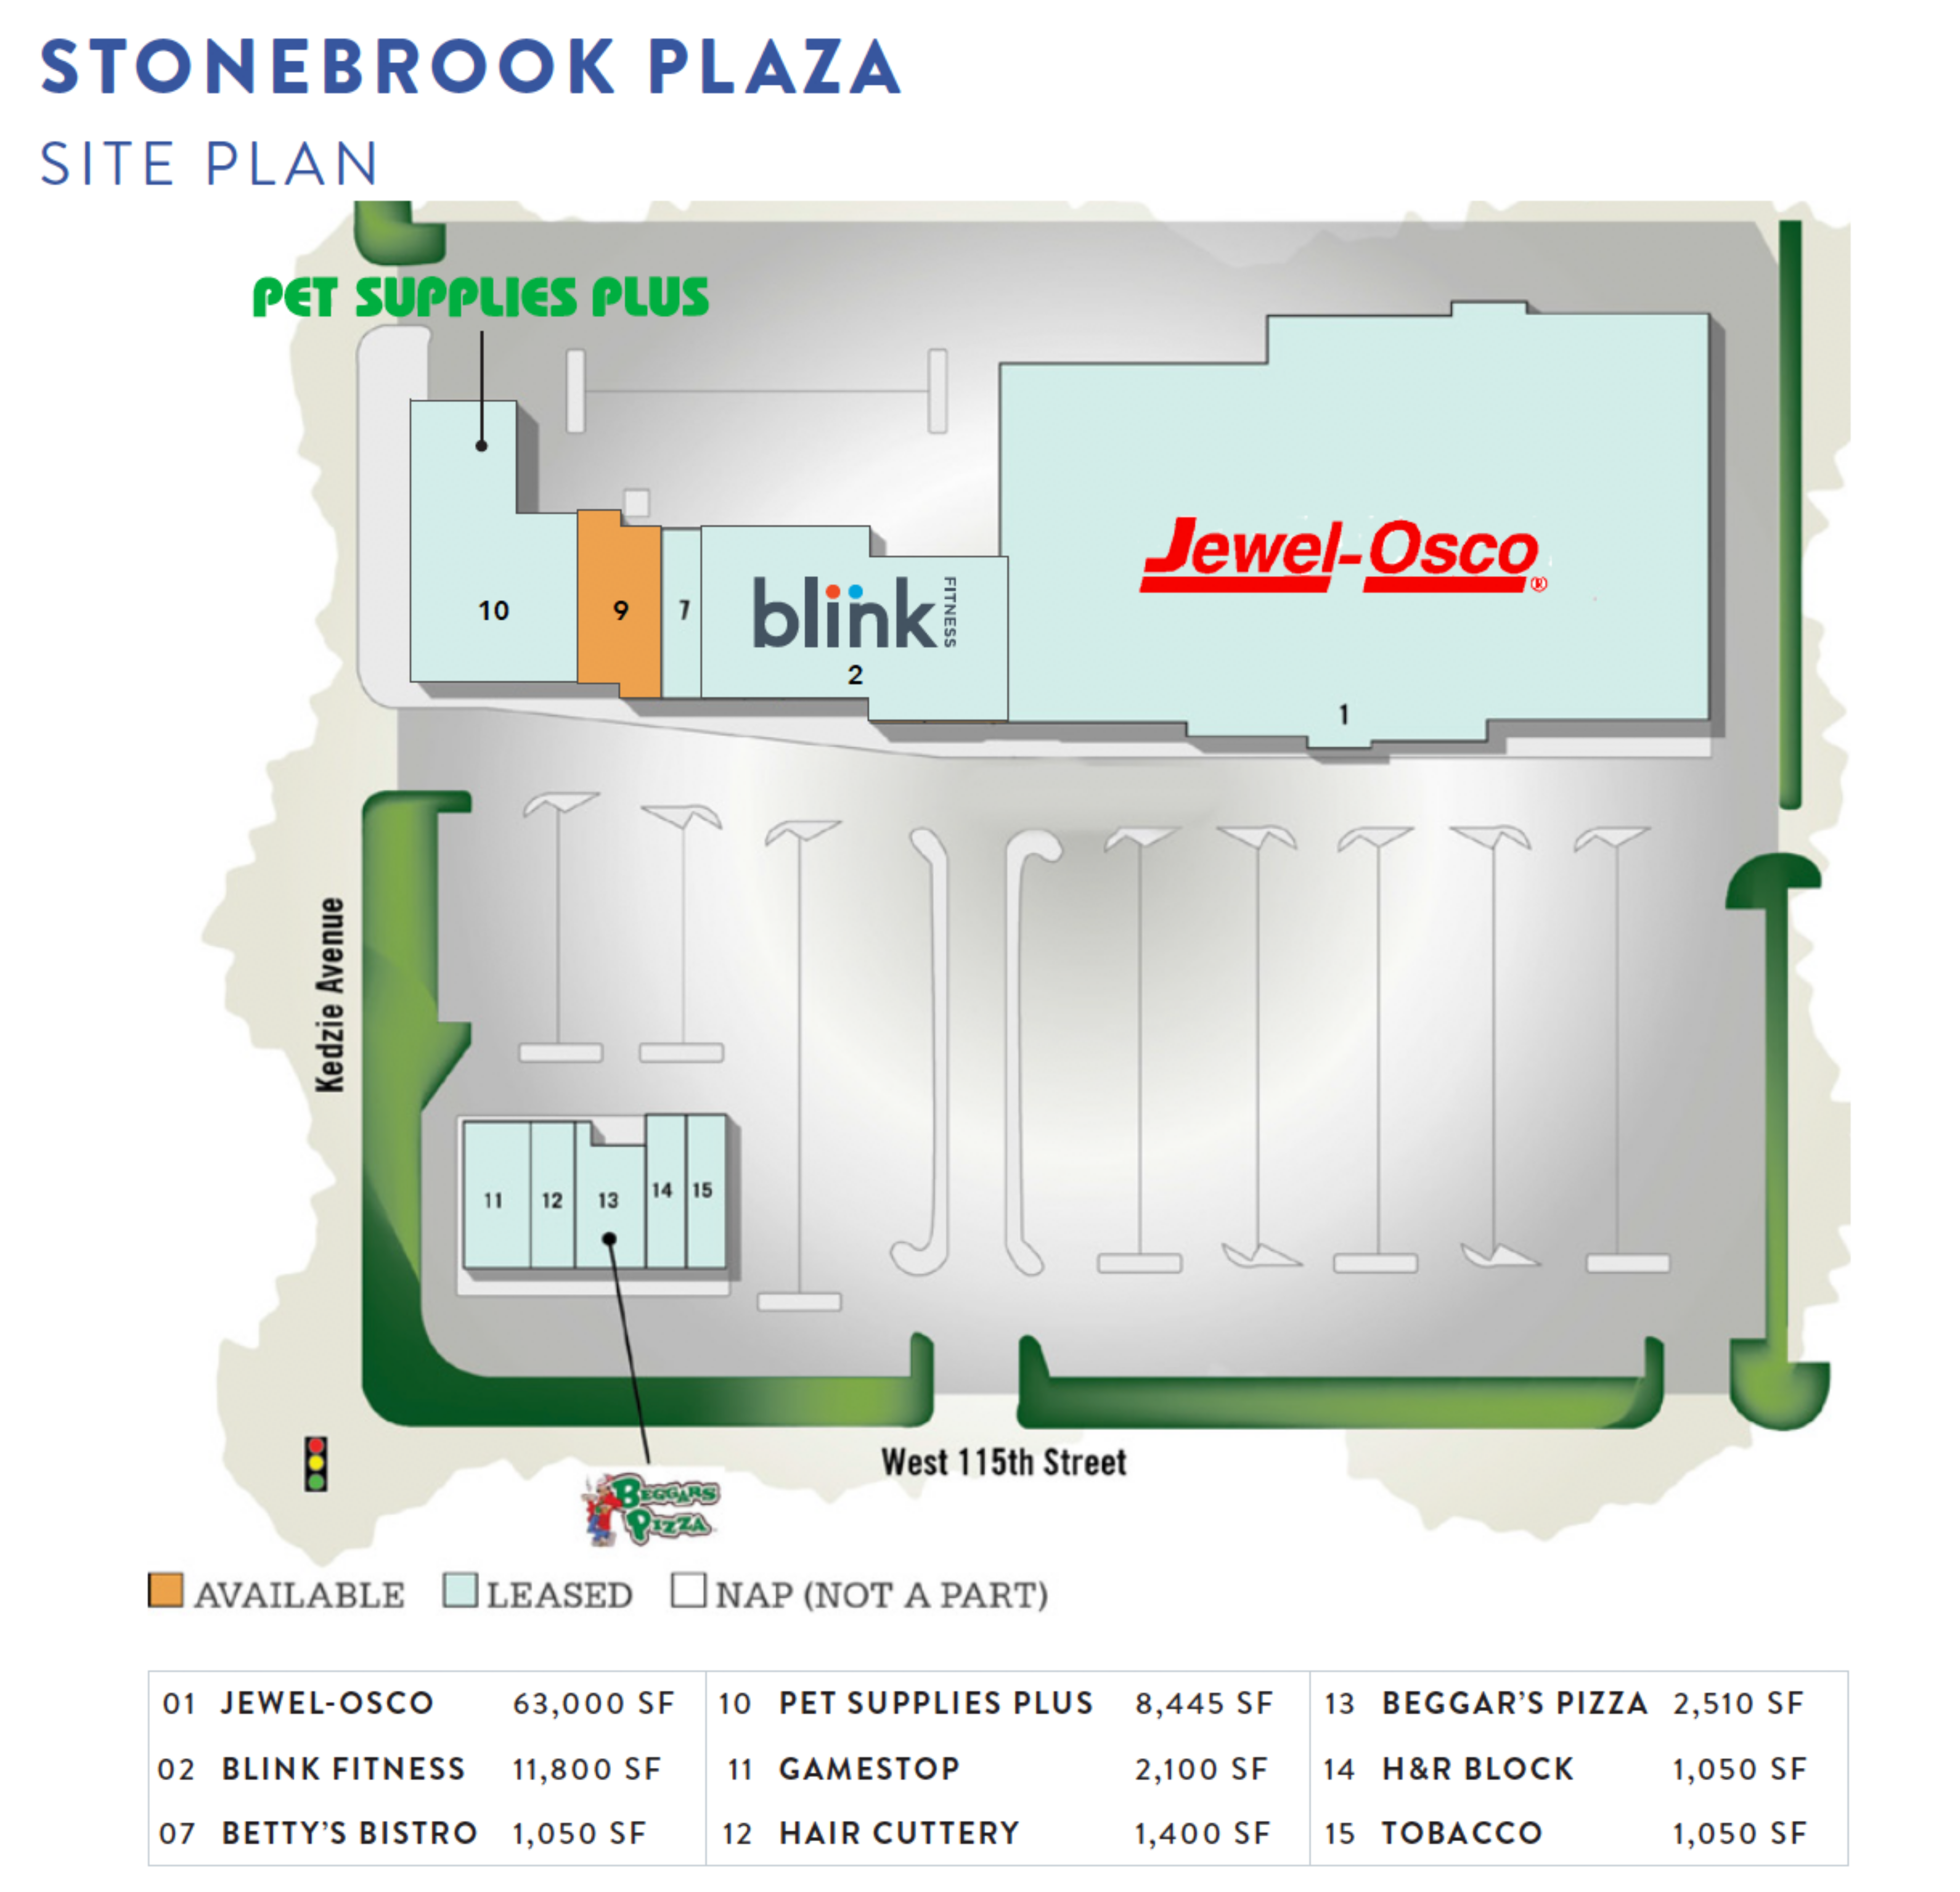 Stonebrook Plaza: site plan